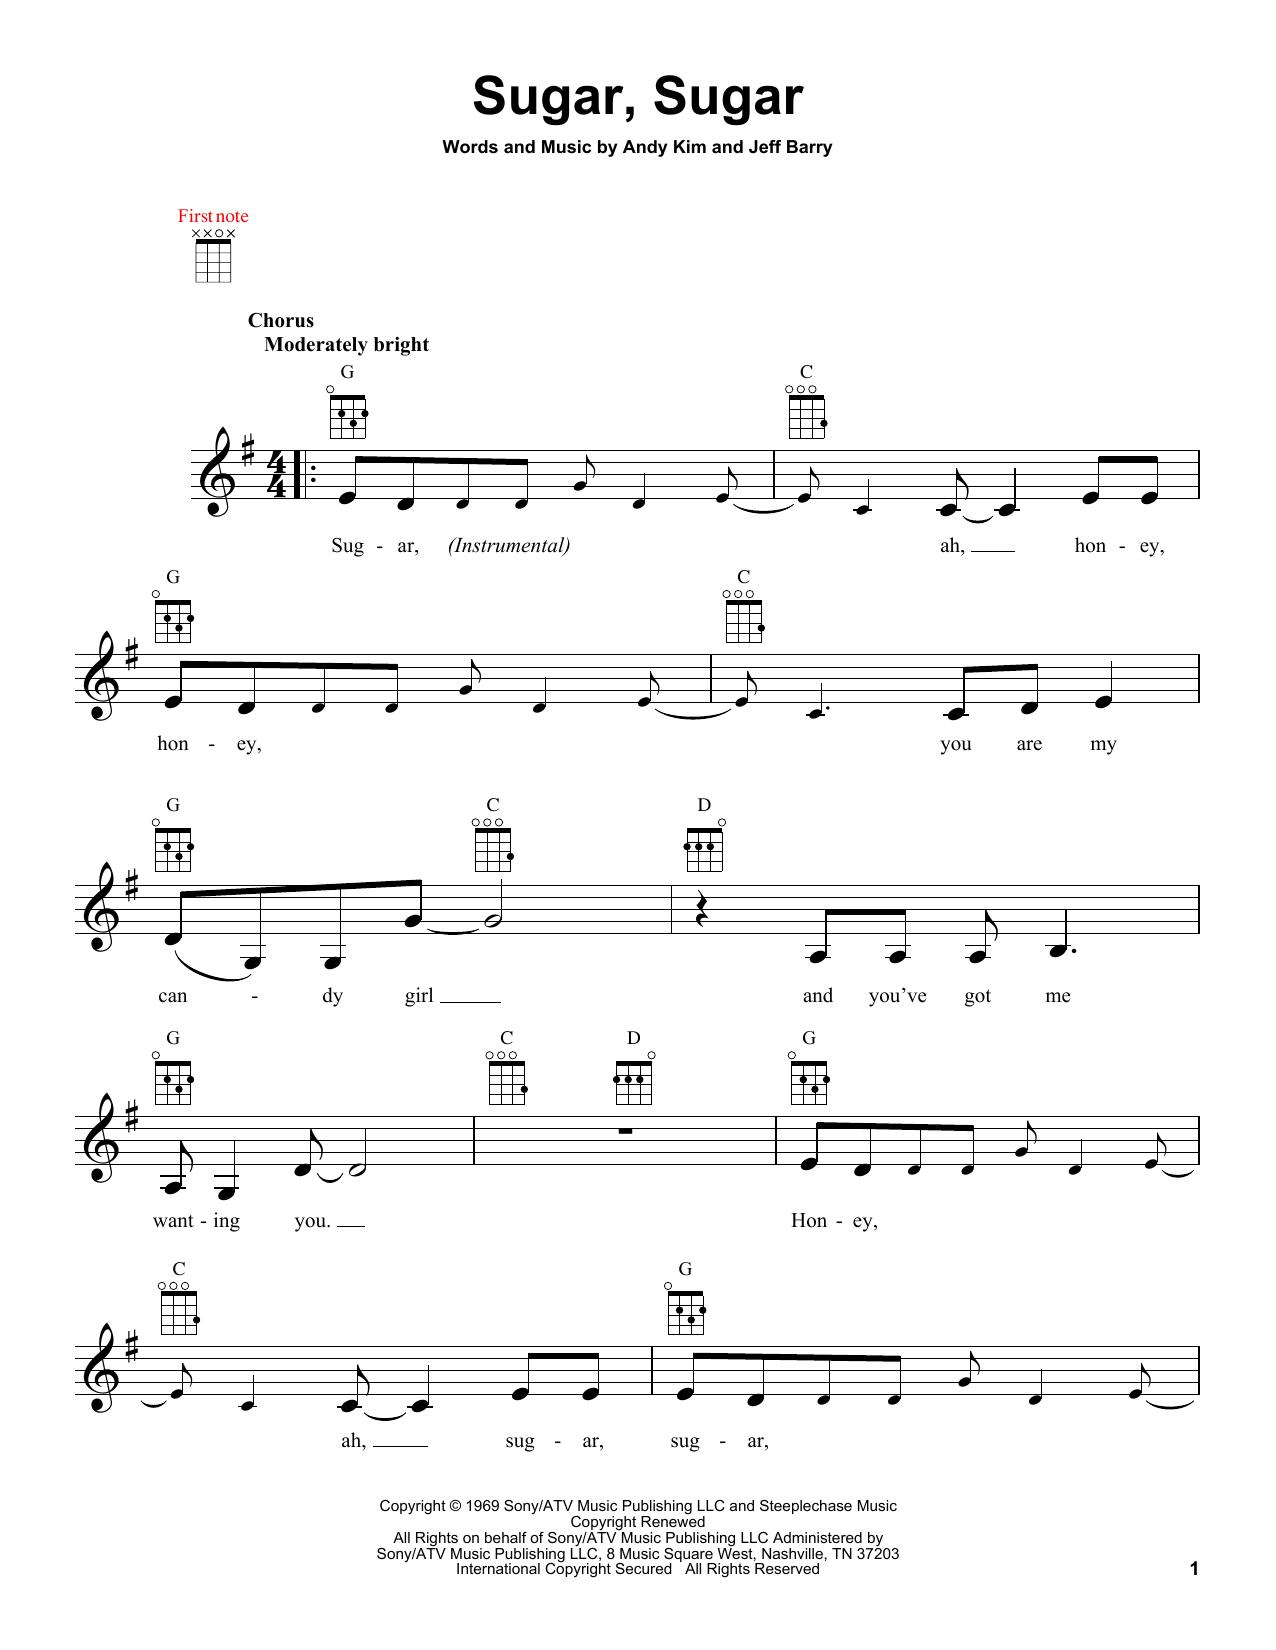 Sugar, Sugar sheet music by The Archies (Ukulele u2013 151809)